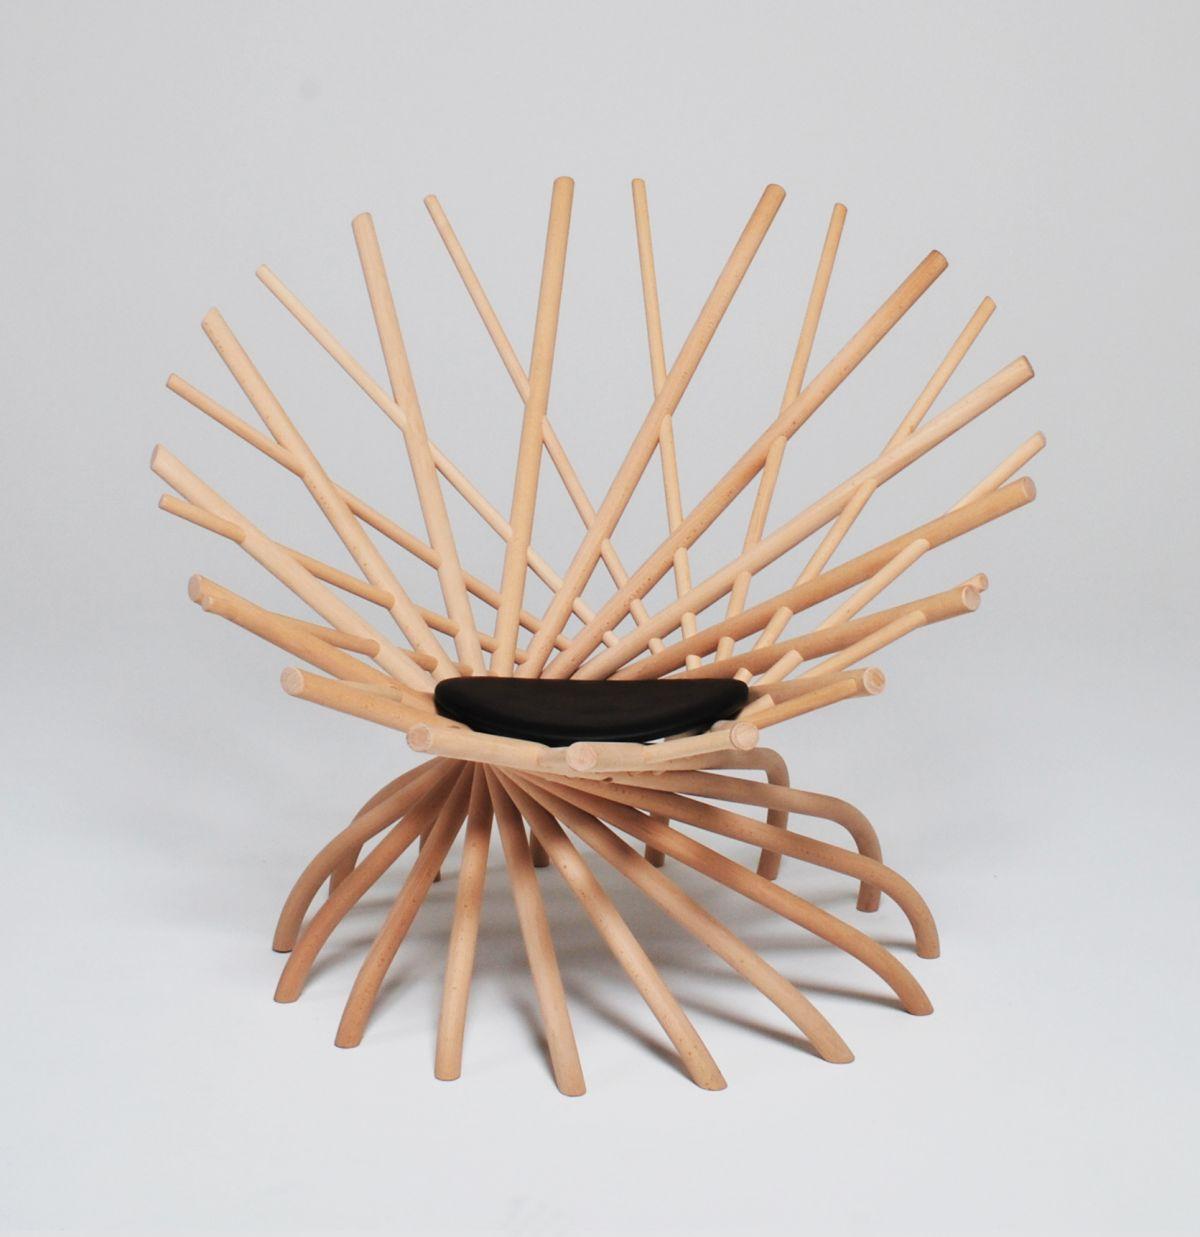 Swedish Designer Markus Johansson Has Created The NEST Chair.